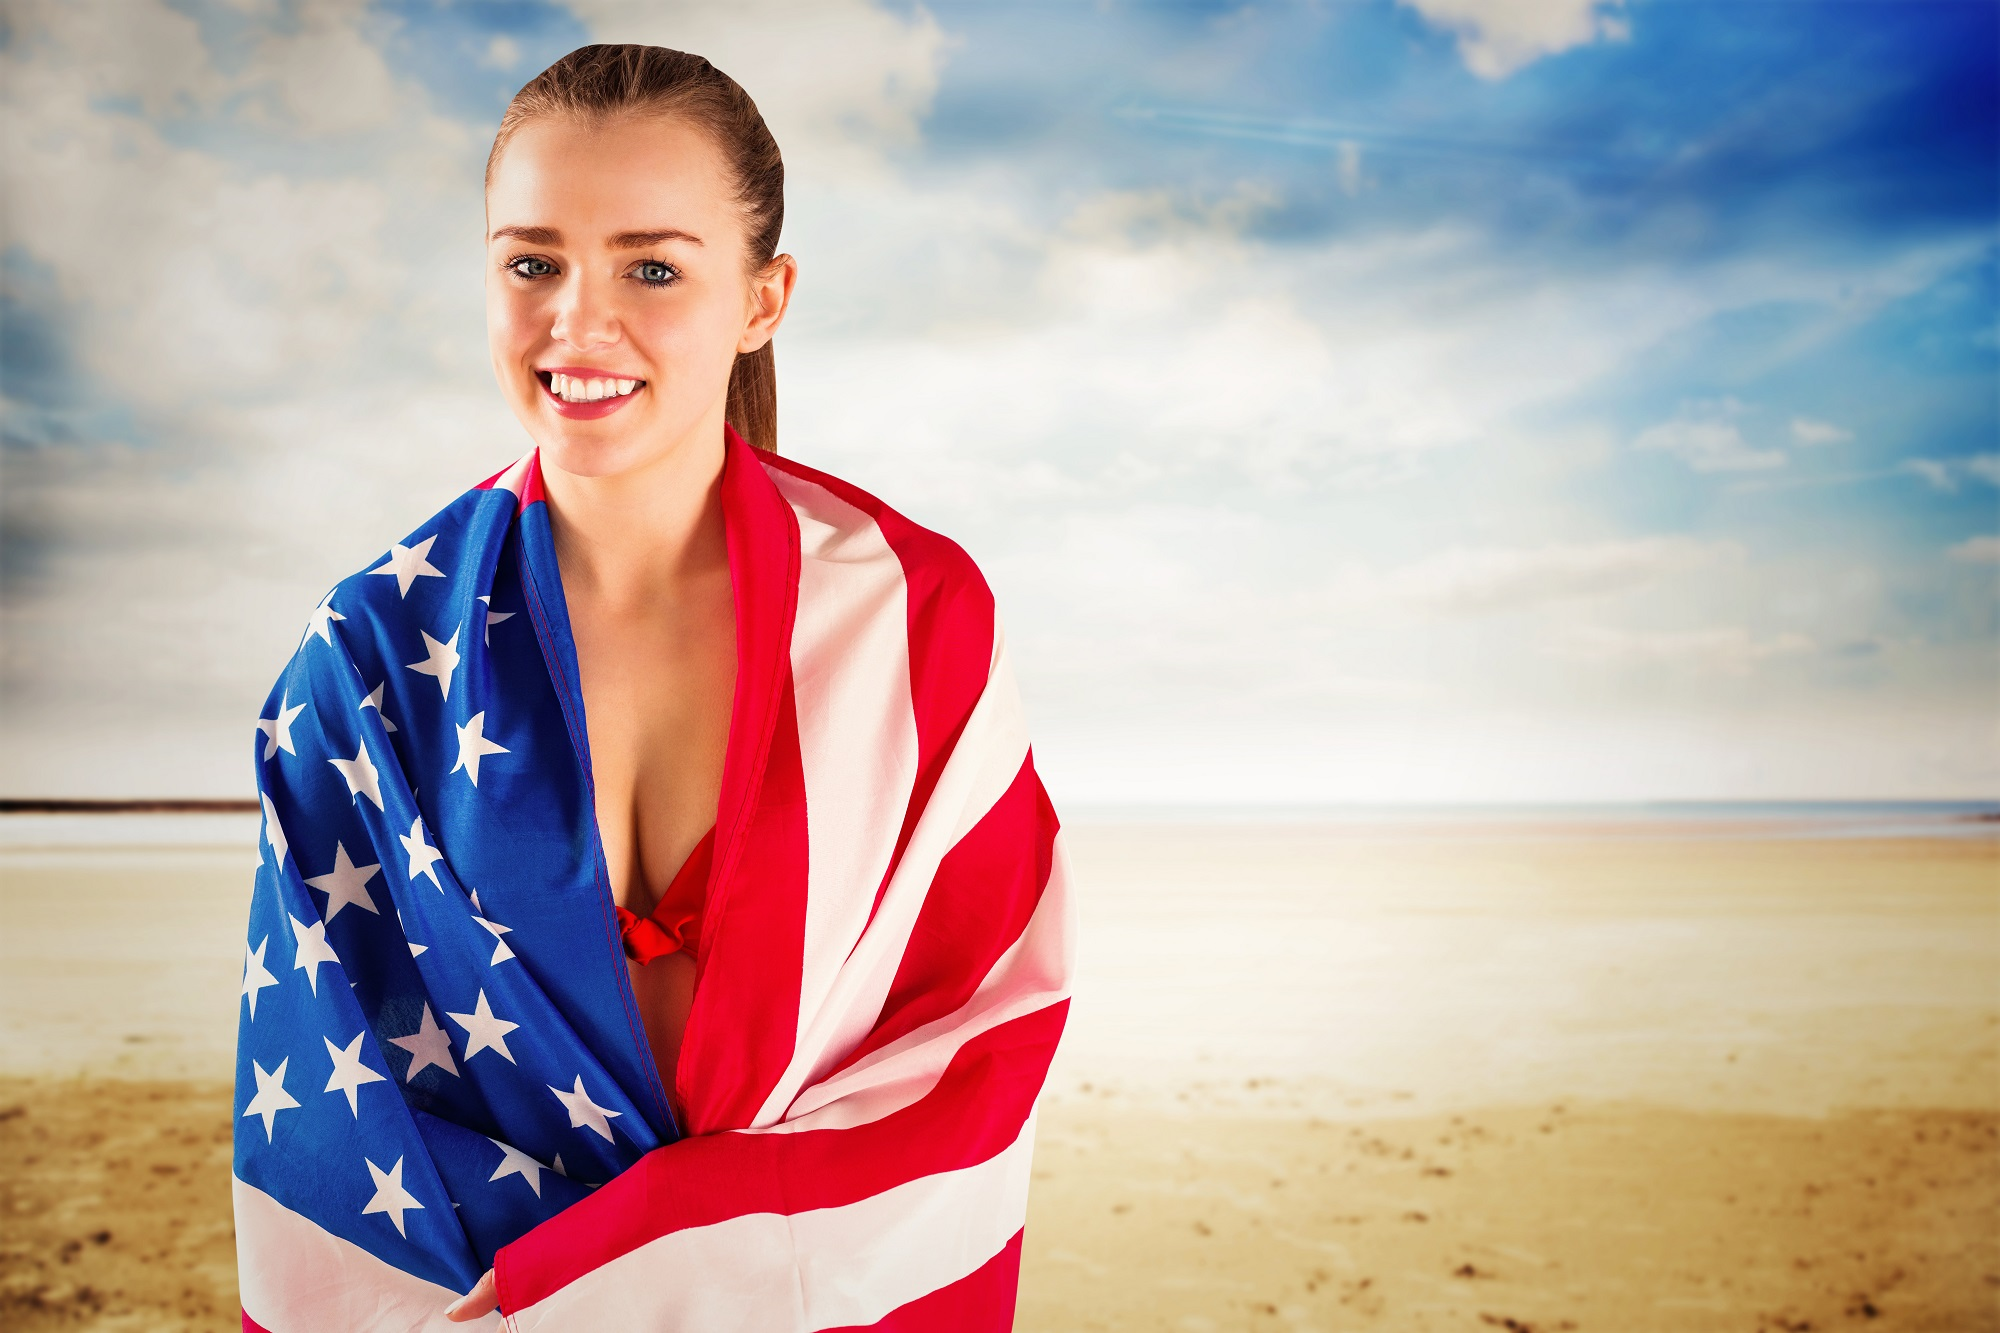 American flag bikini 6 Shutterstock wavebreakmedia